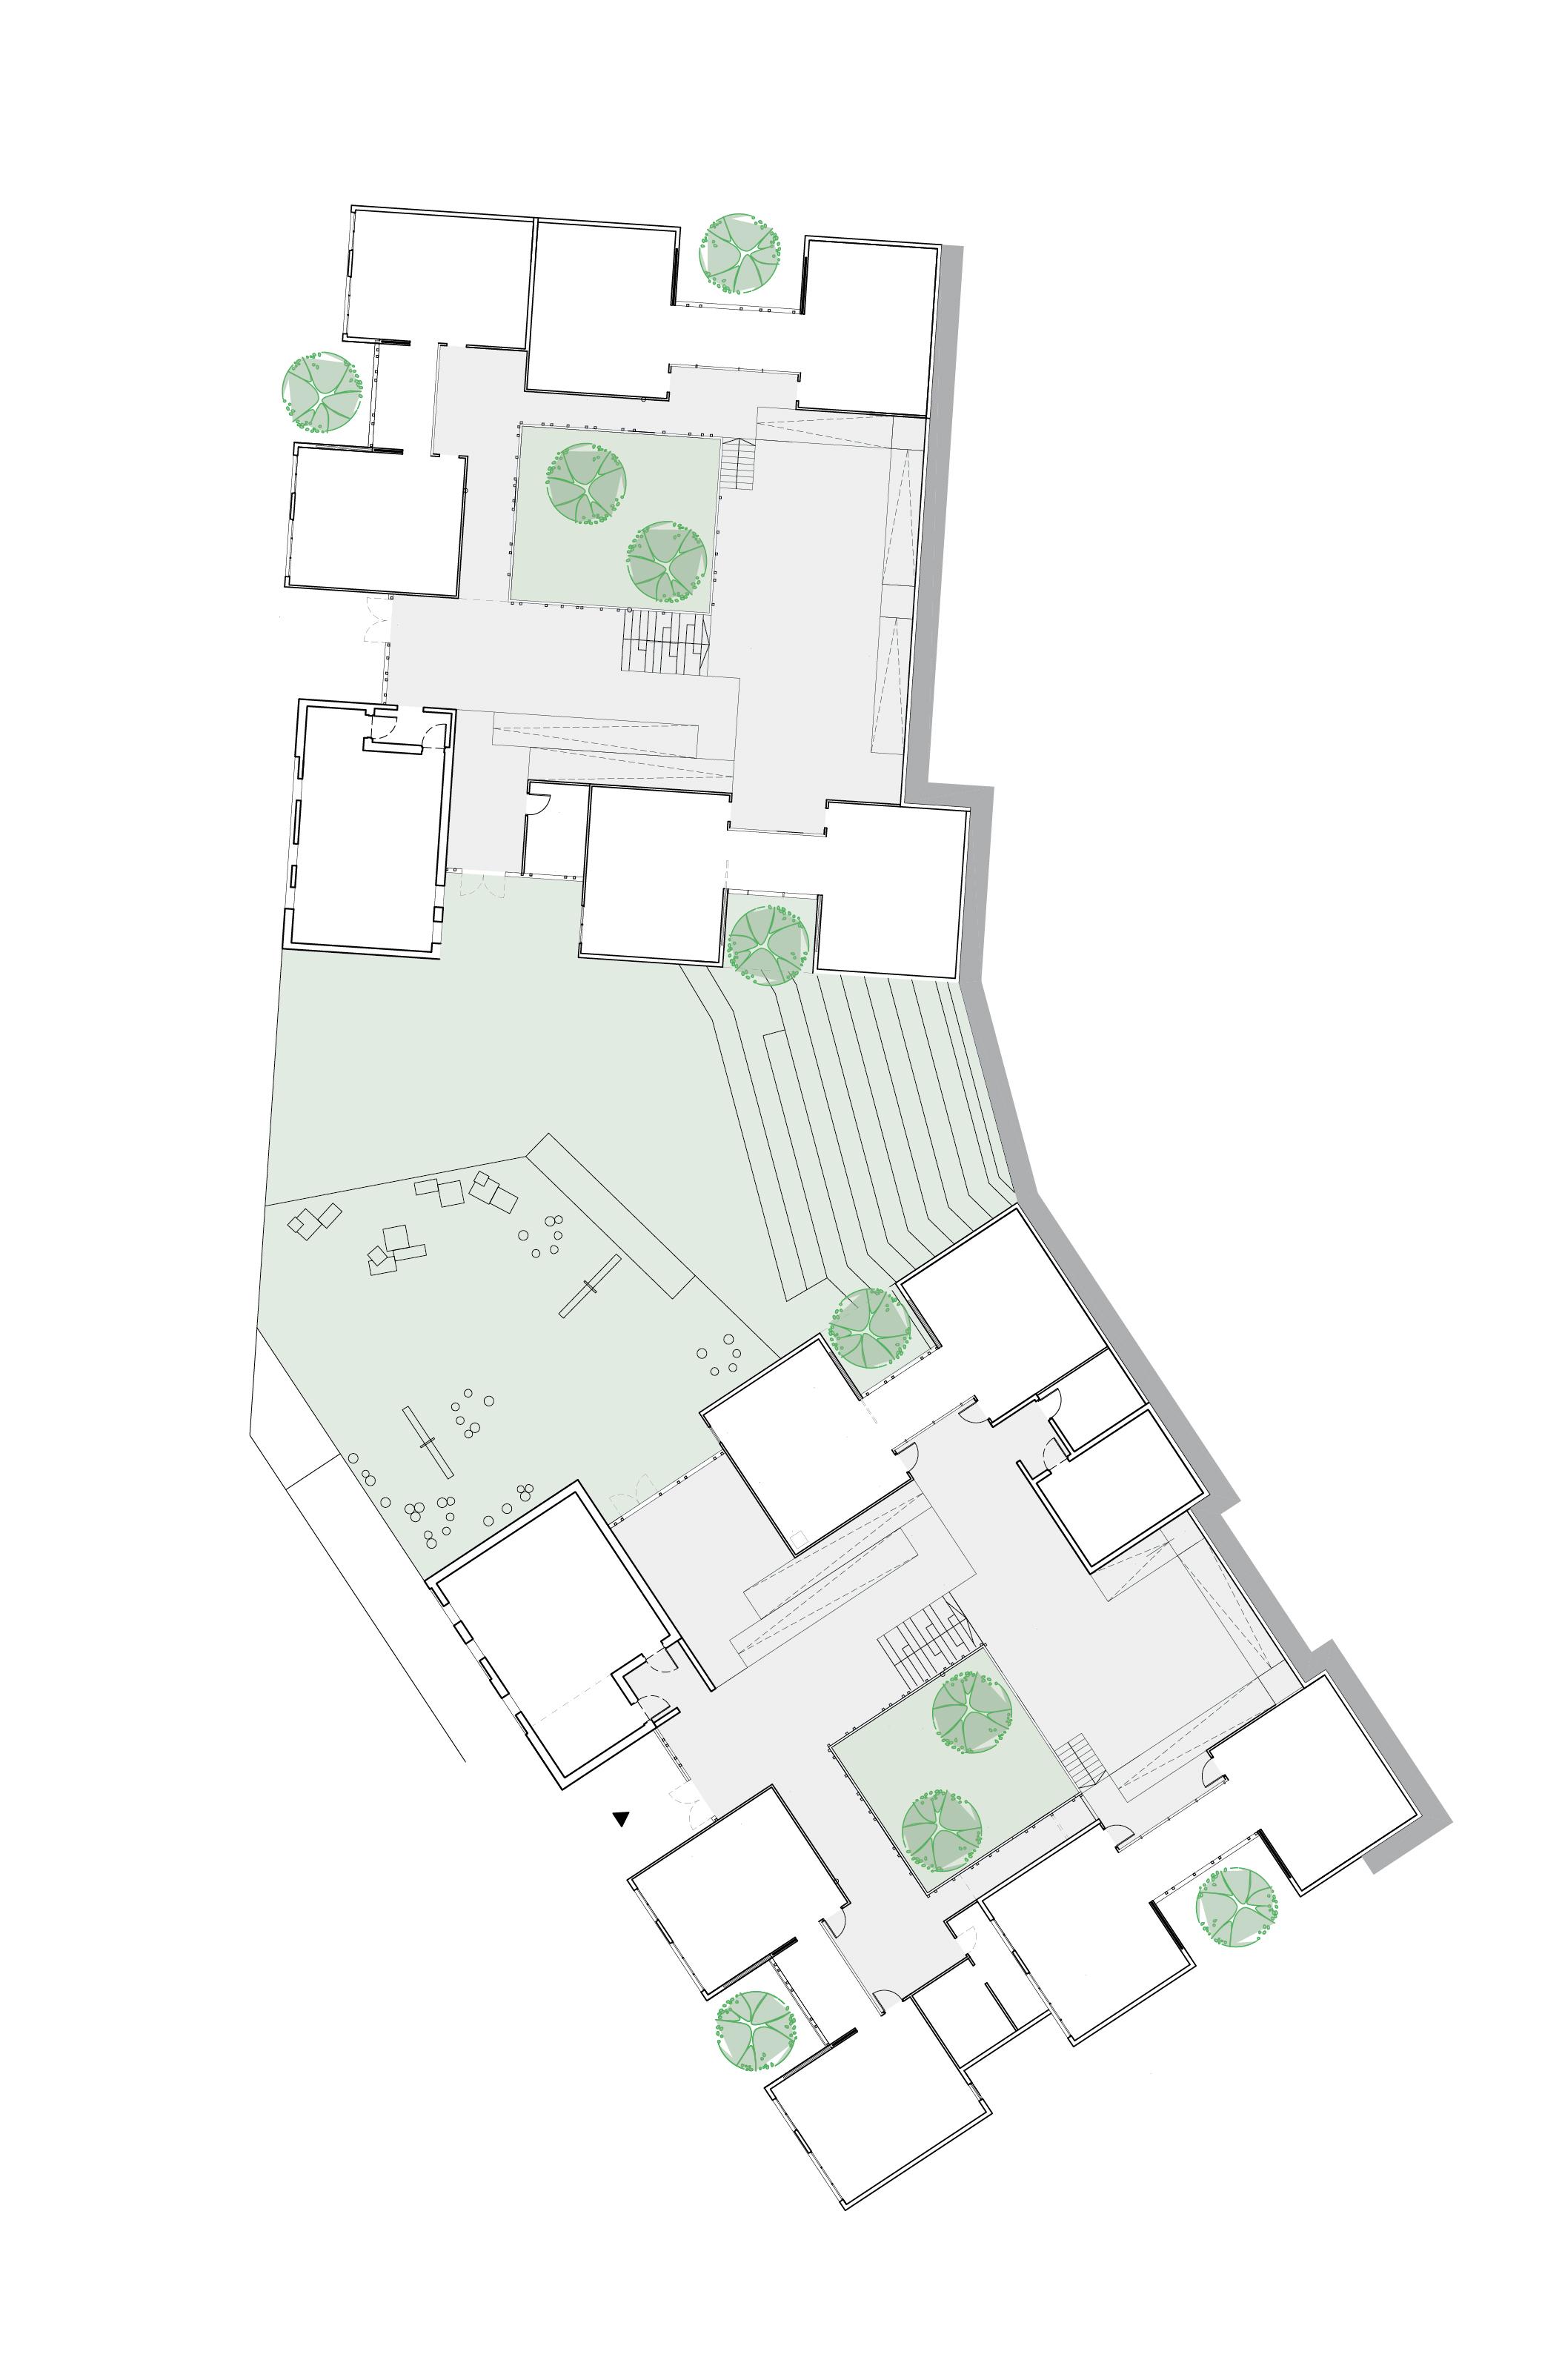 LAVON ELEMNTARY SCHOOL PLAN